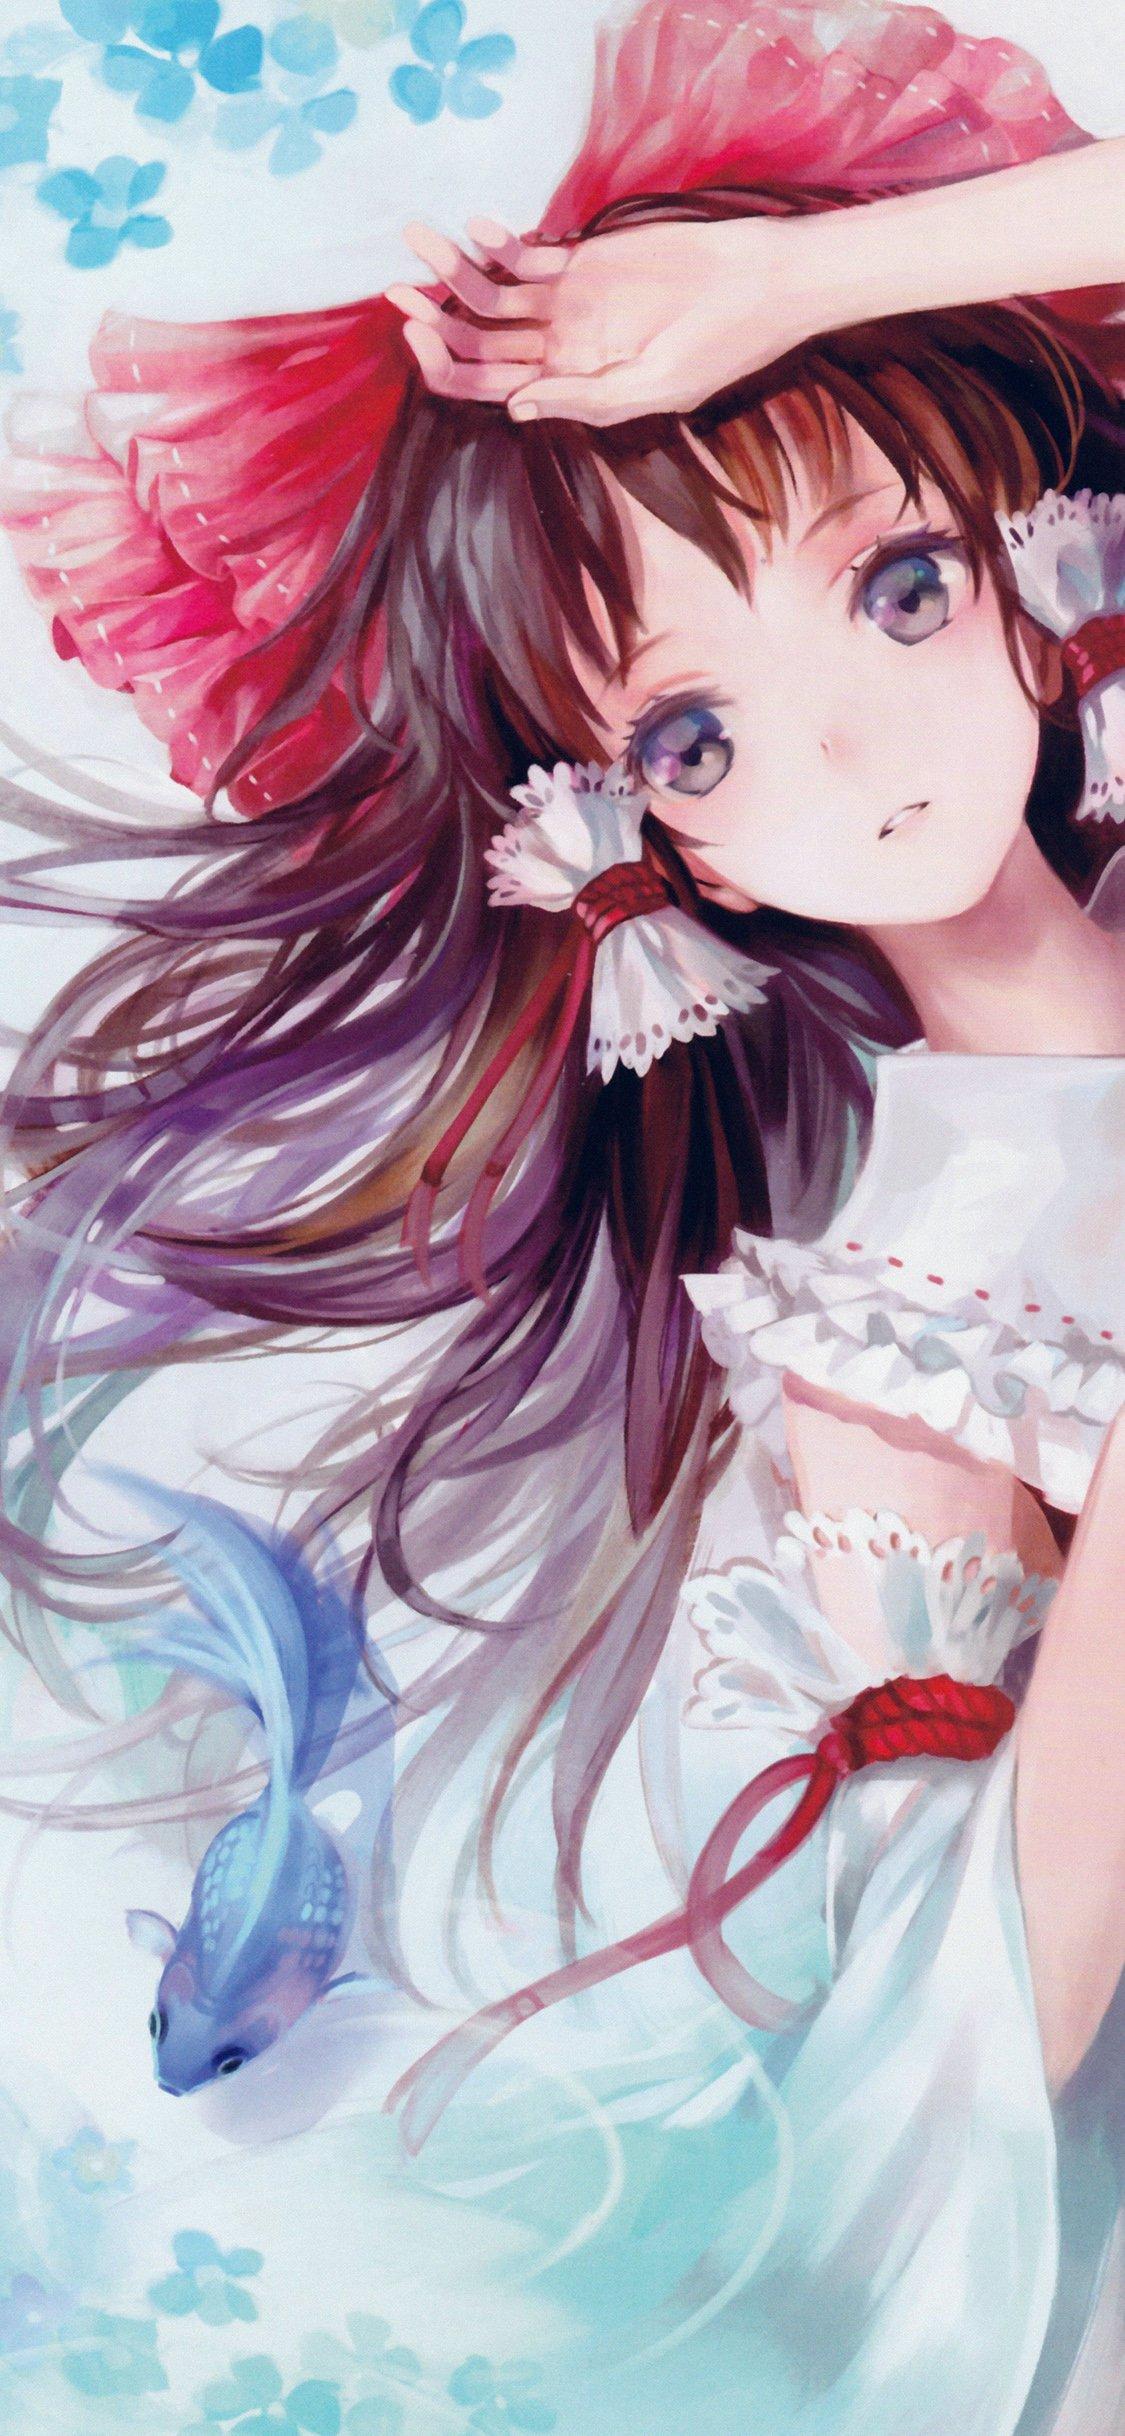 Iphoneロック画面かわいいアニメ かわいいアニメの携帯壁紙 1125x2436 Wallpapertip